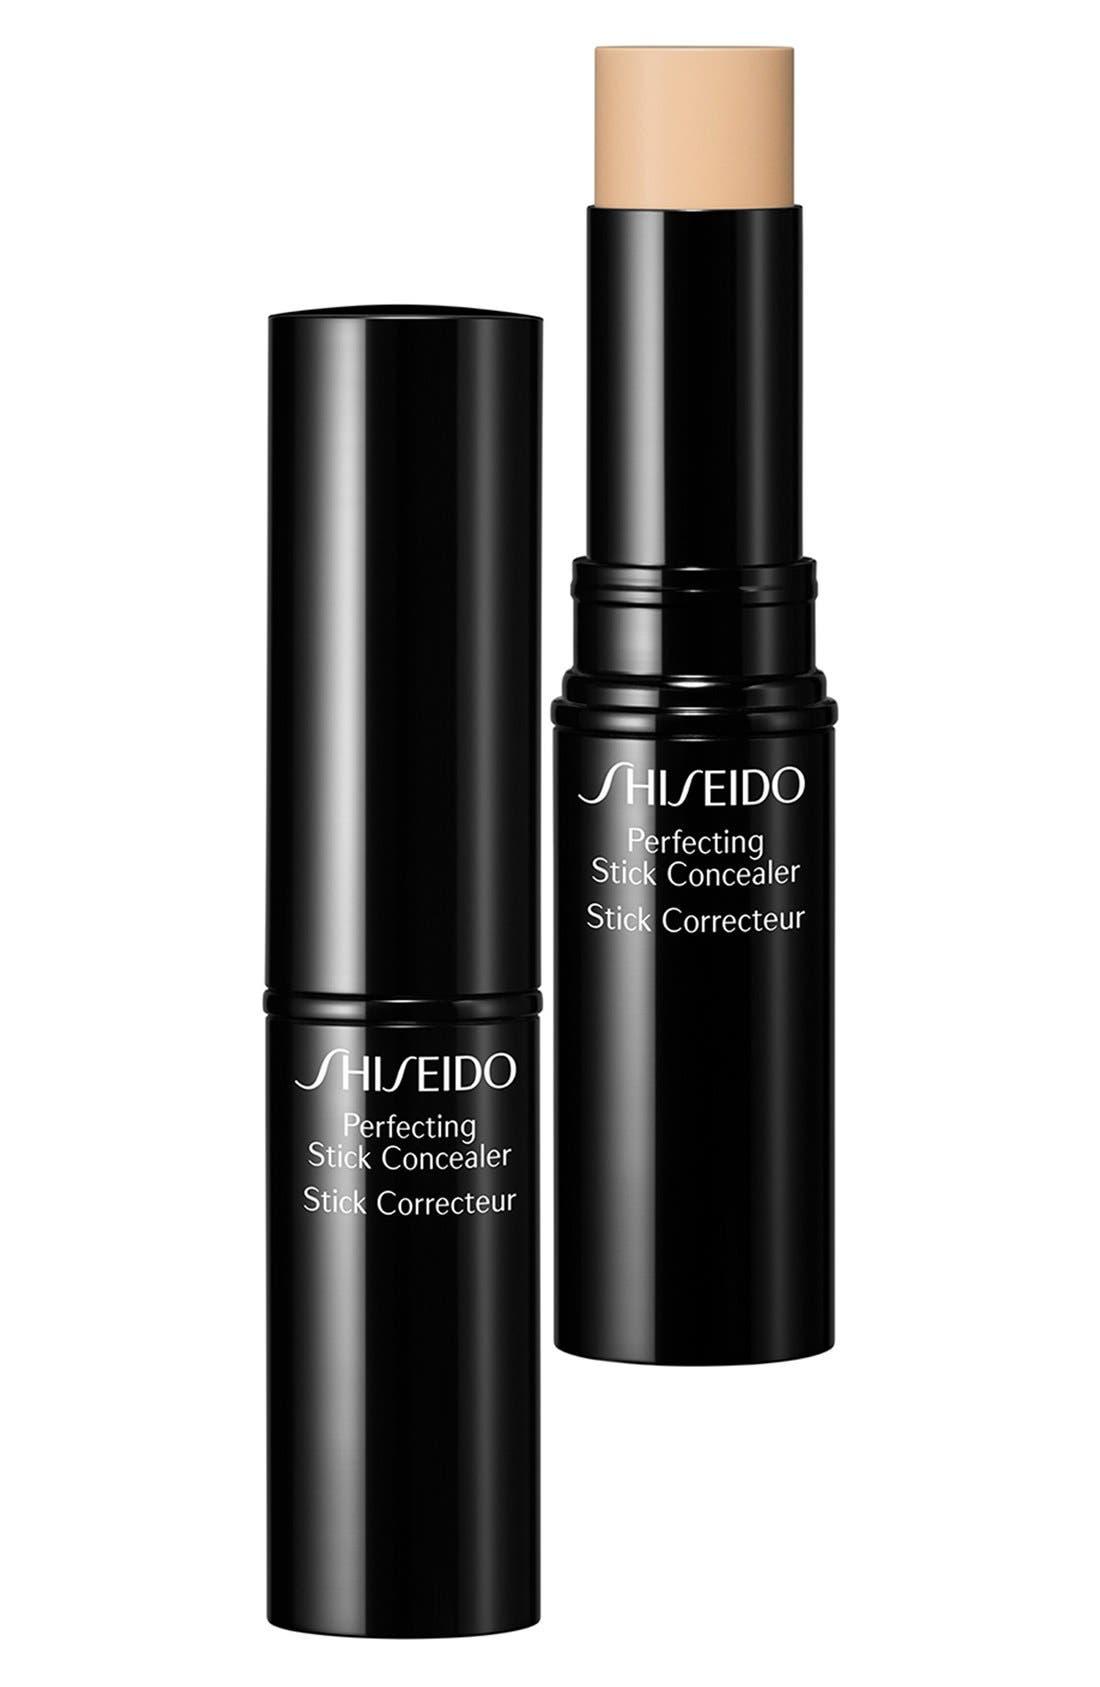 Shiseido 'Perfecting' Stick Concealer